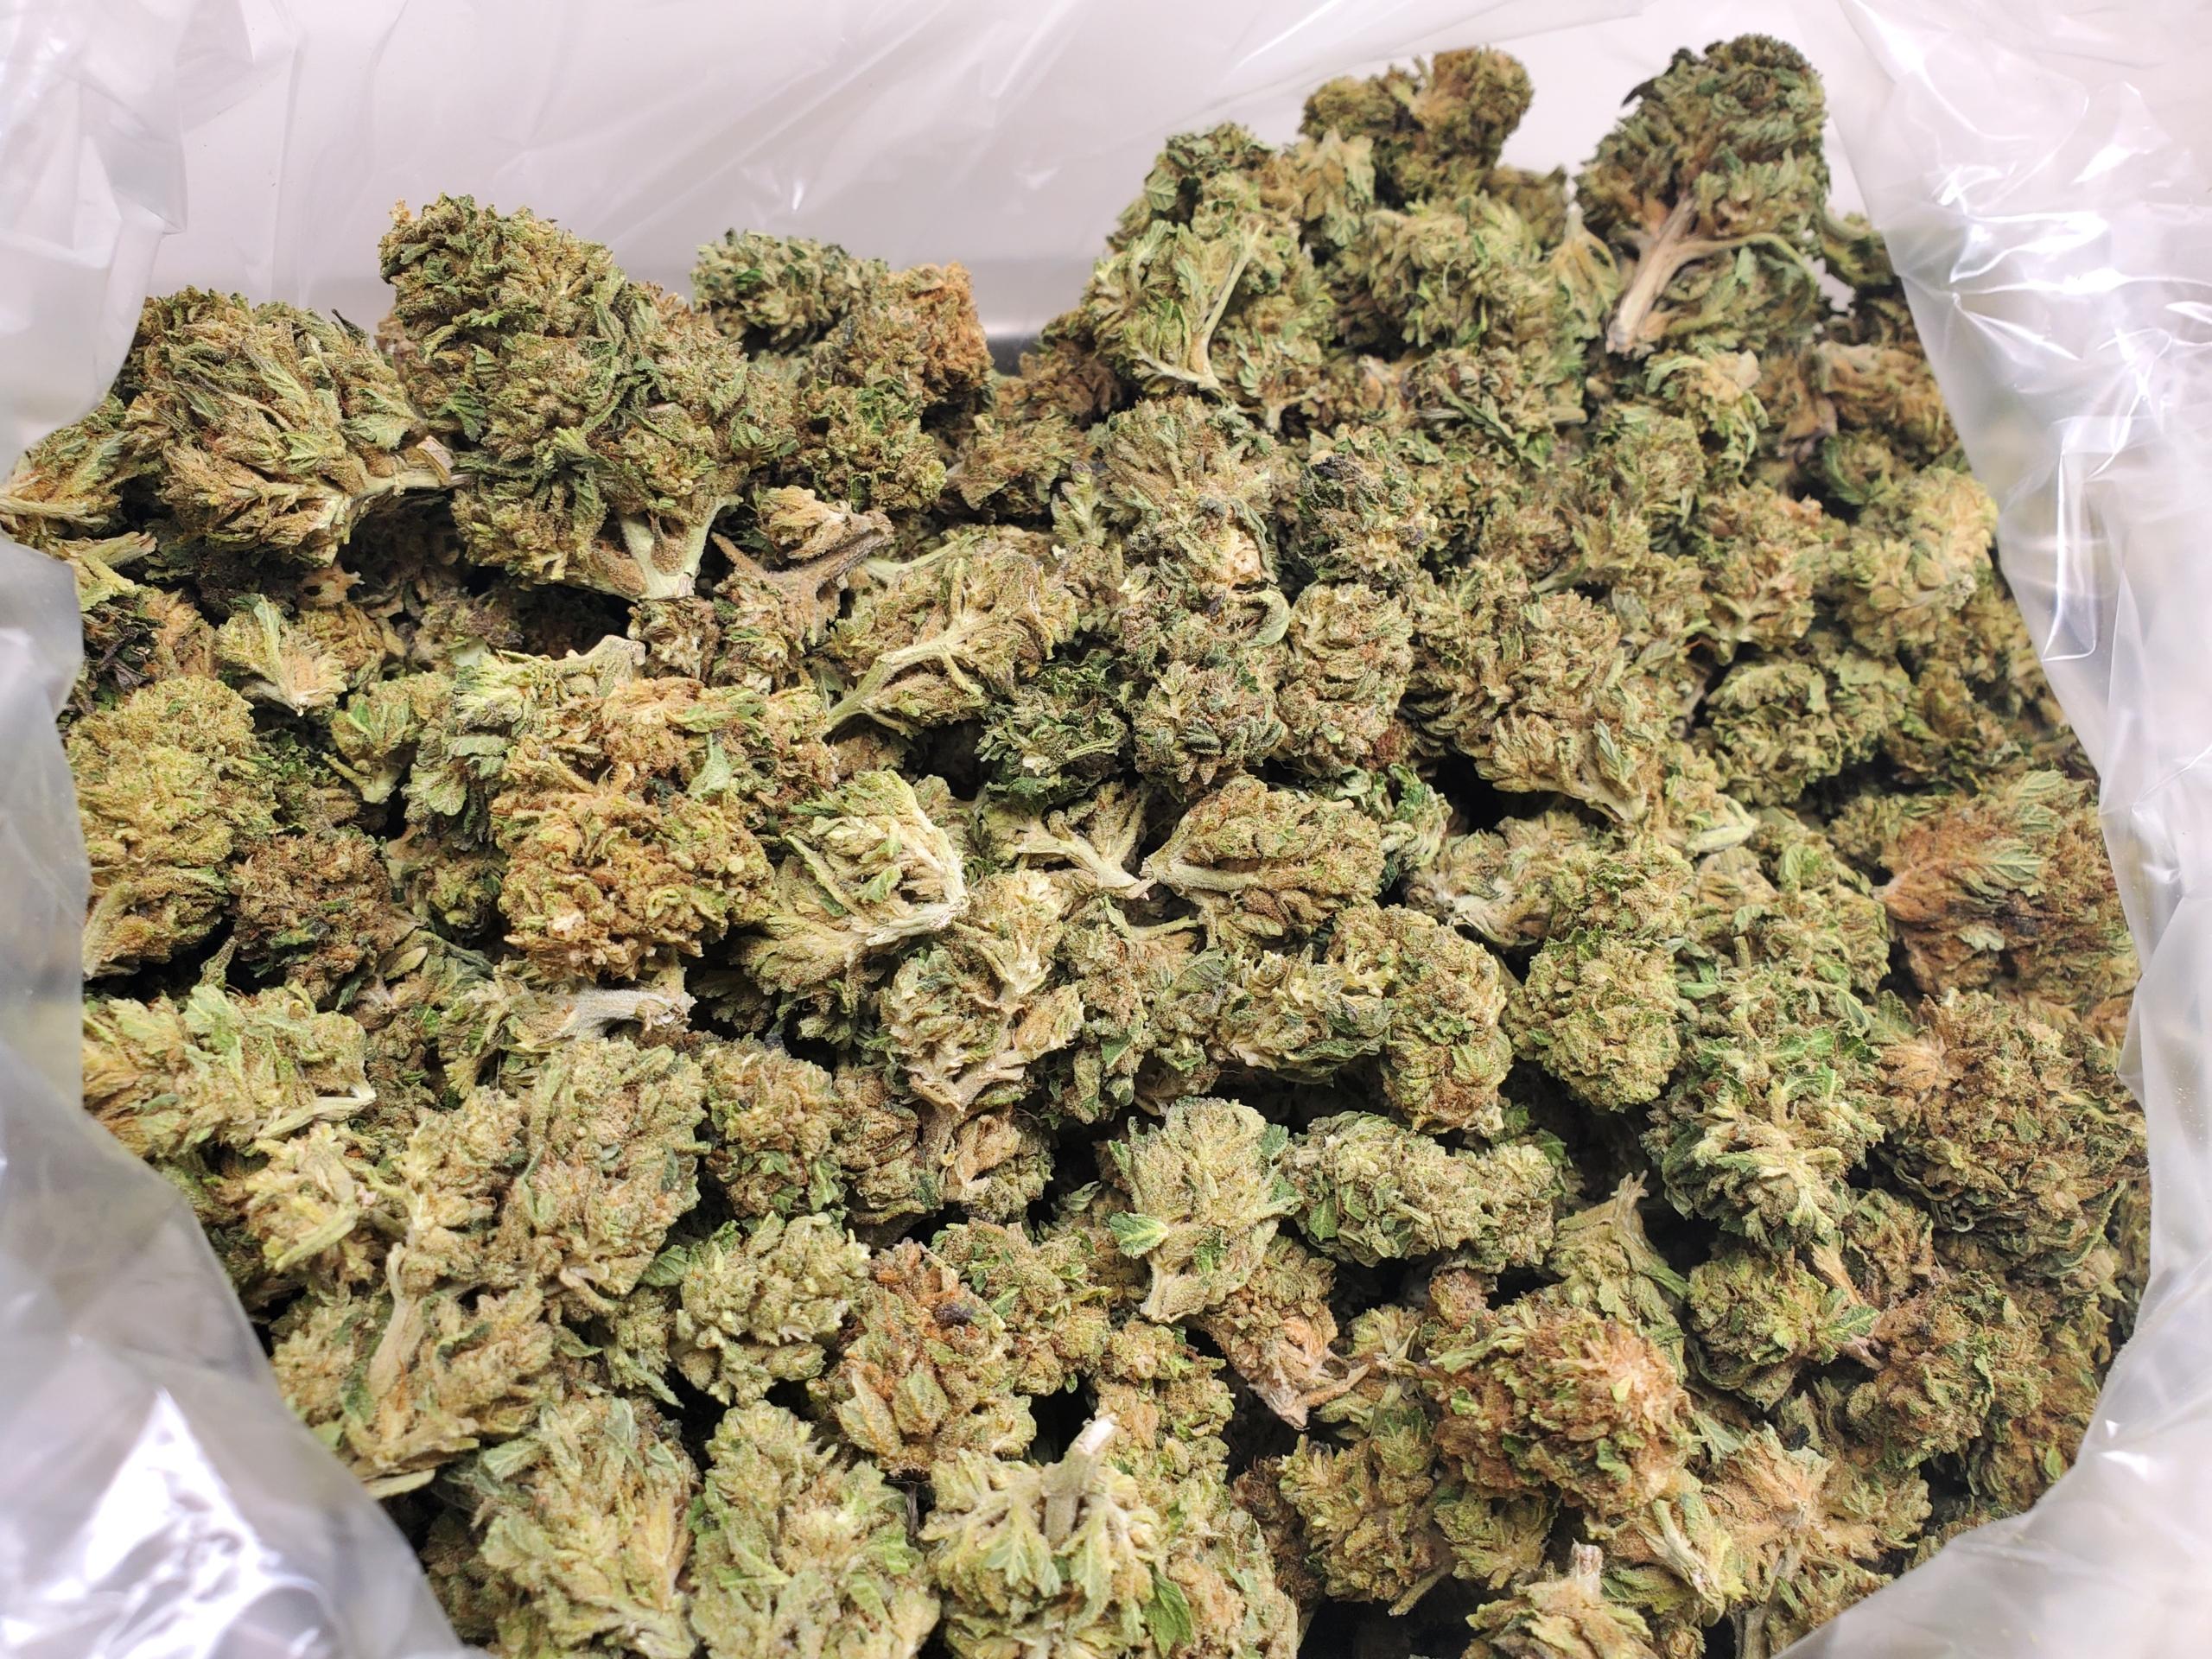 Cbd Hemp Flower 1 Lb Super Lemon Haze Rhizo Sciences Hemp Extracts For Sale Thc Free Cbd Oil Distillate Isolate 99 Cannabinoids Cbg Cbda Cbga Cbc Cbdv Thcv Thcp D8 Cbn Rhizo Sciences